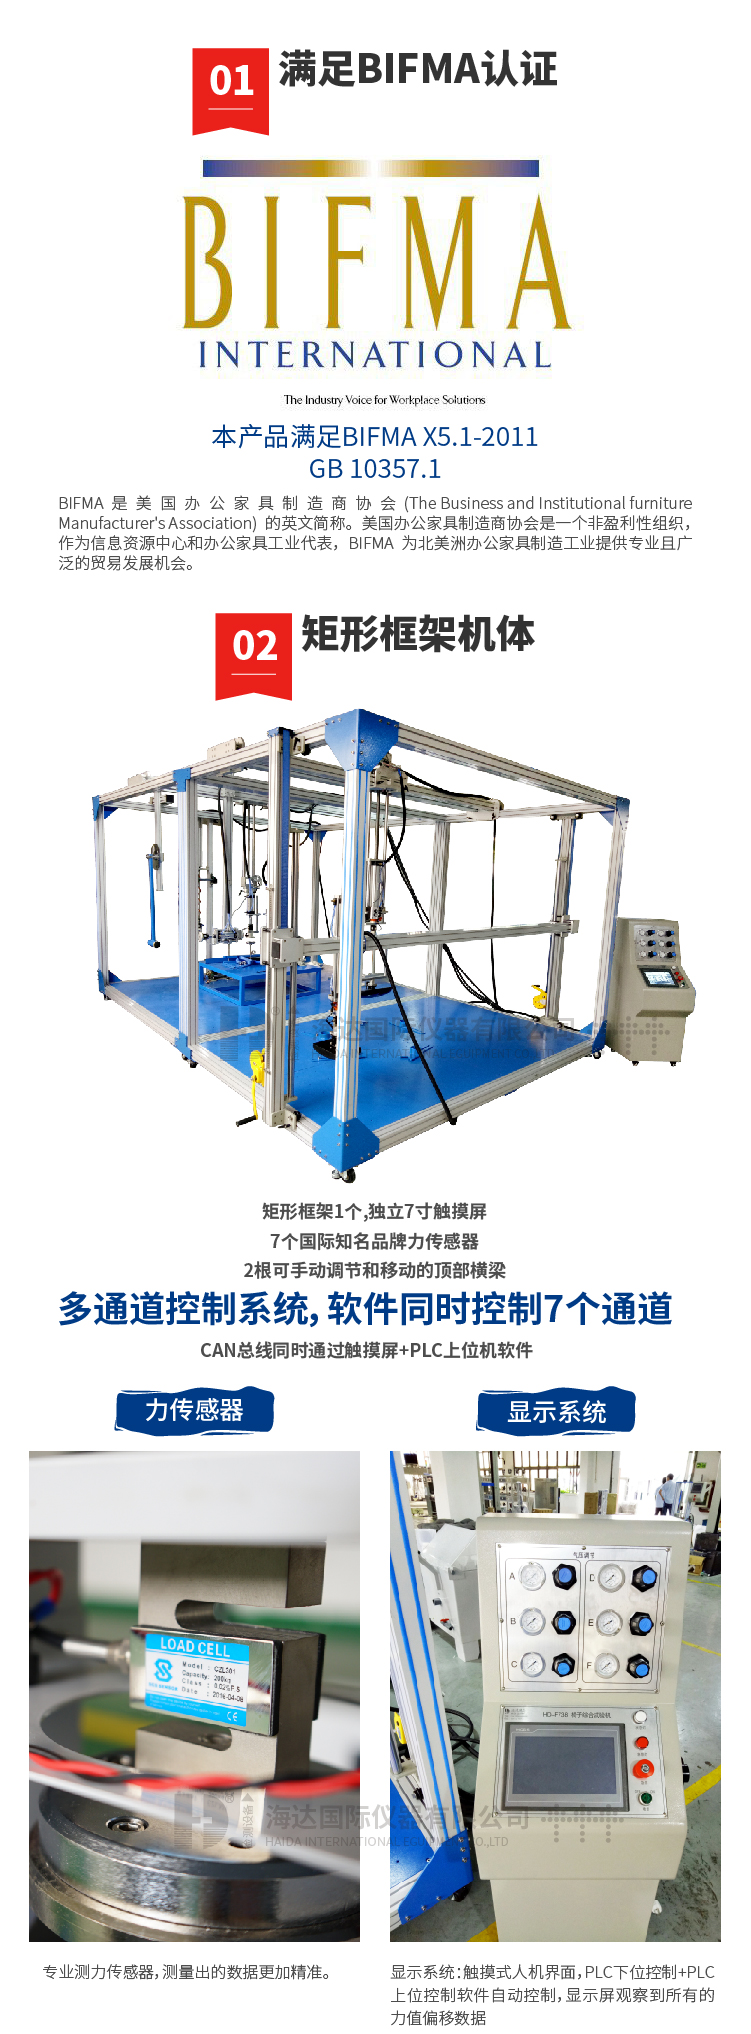 HD-F738 椅子综合测试仪_03.jpg